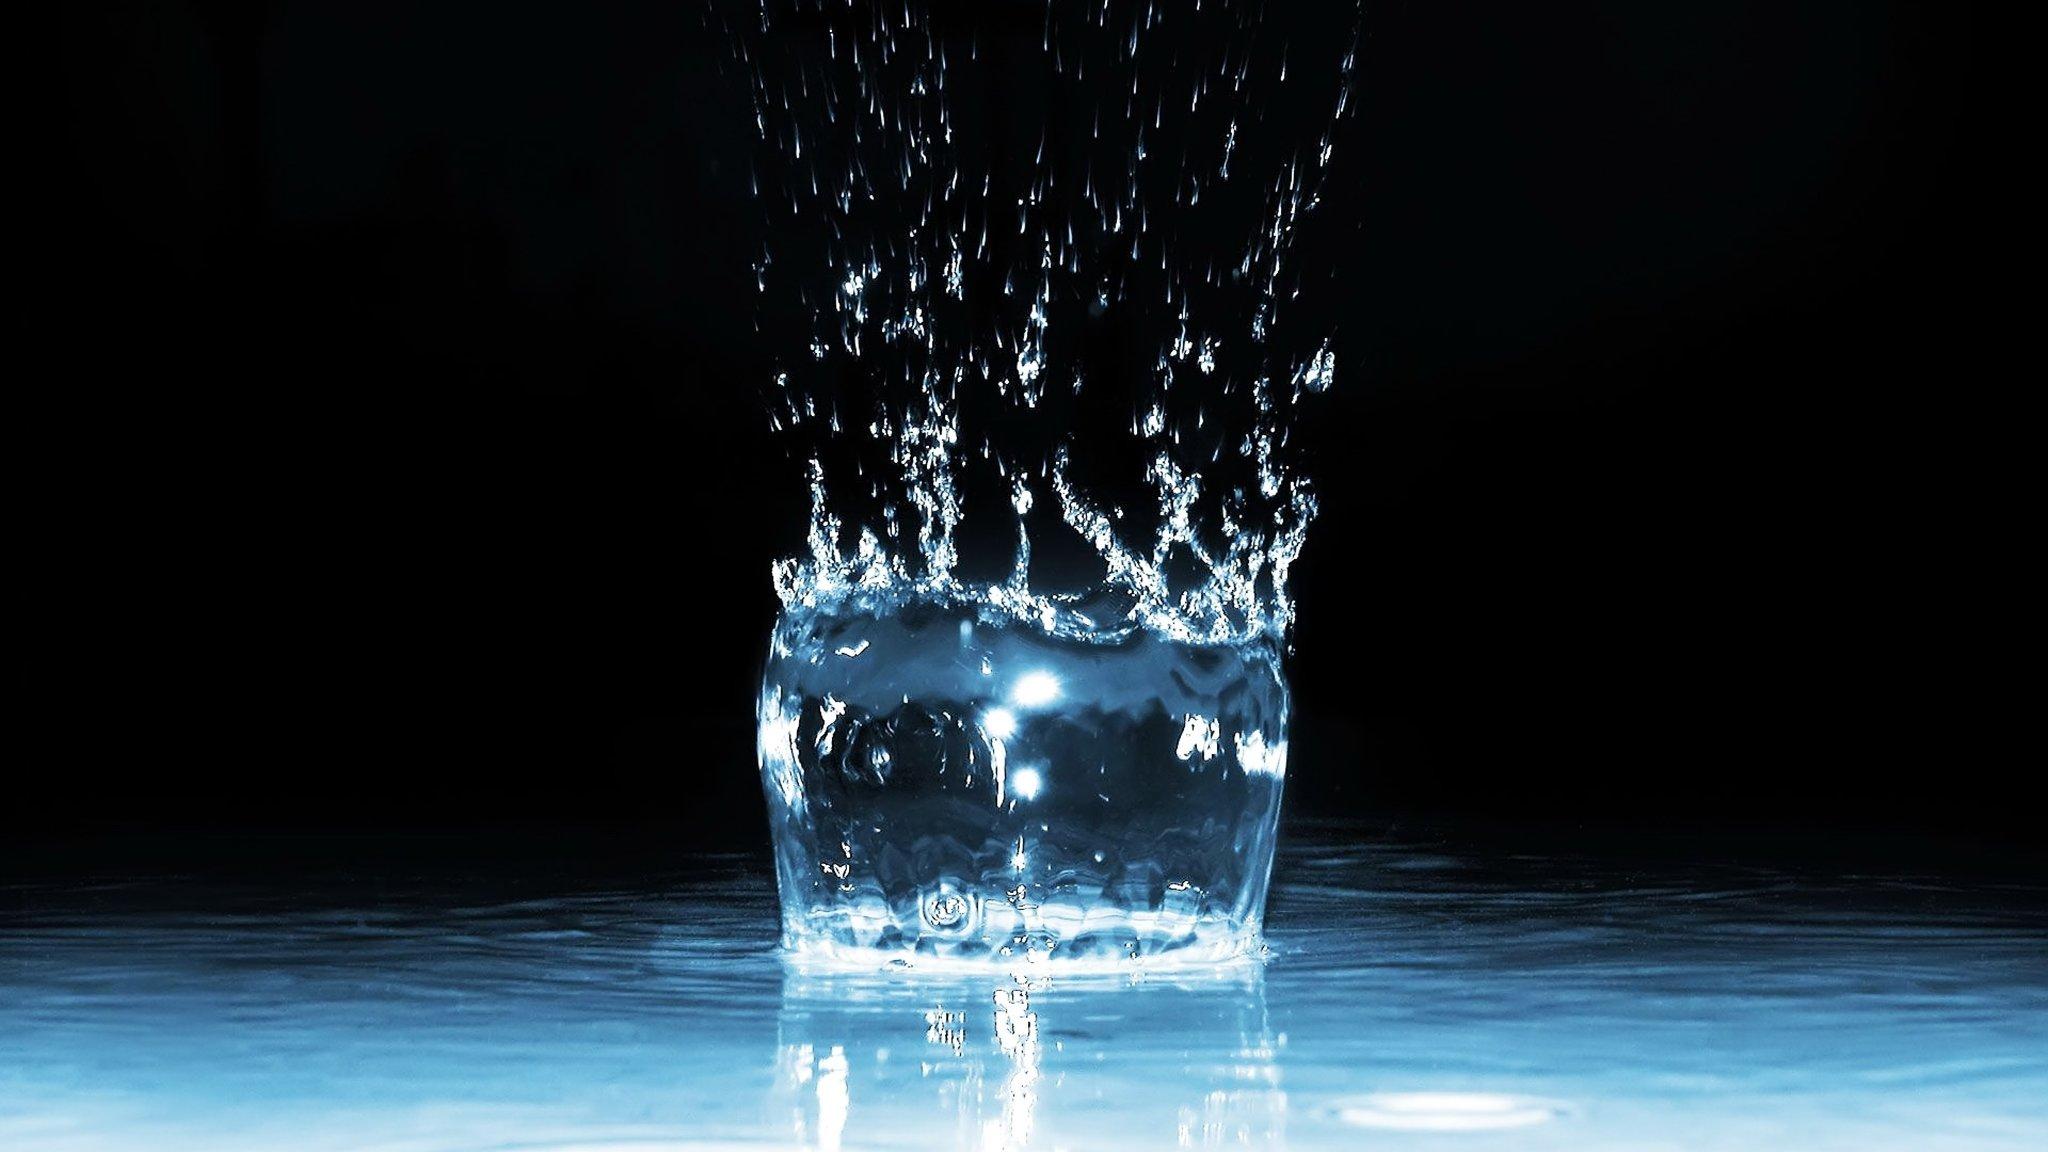 Samenzwering van watergeld